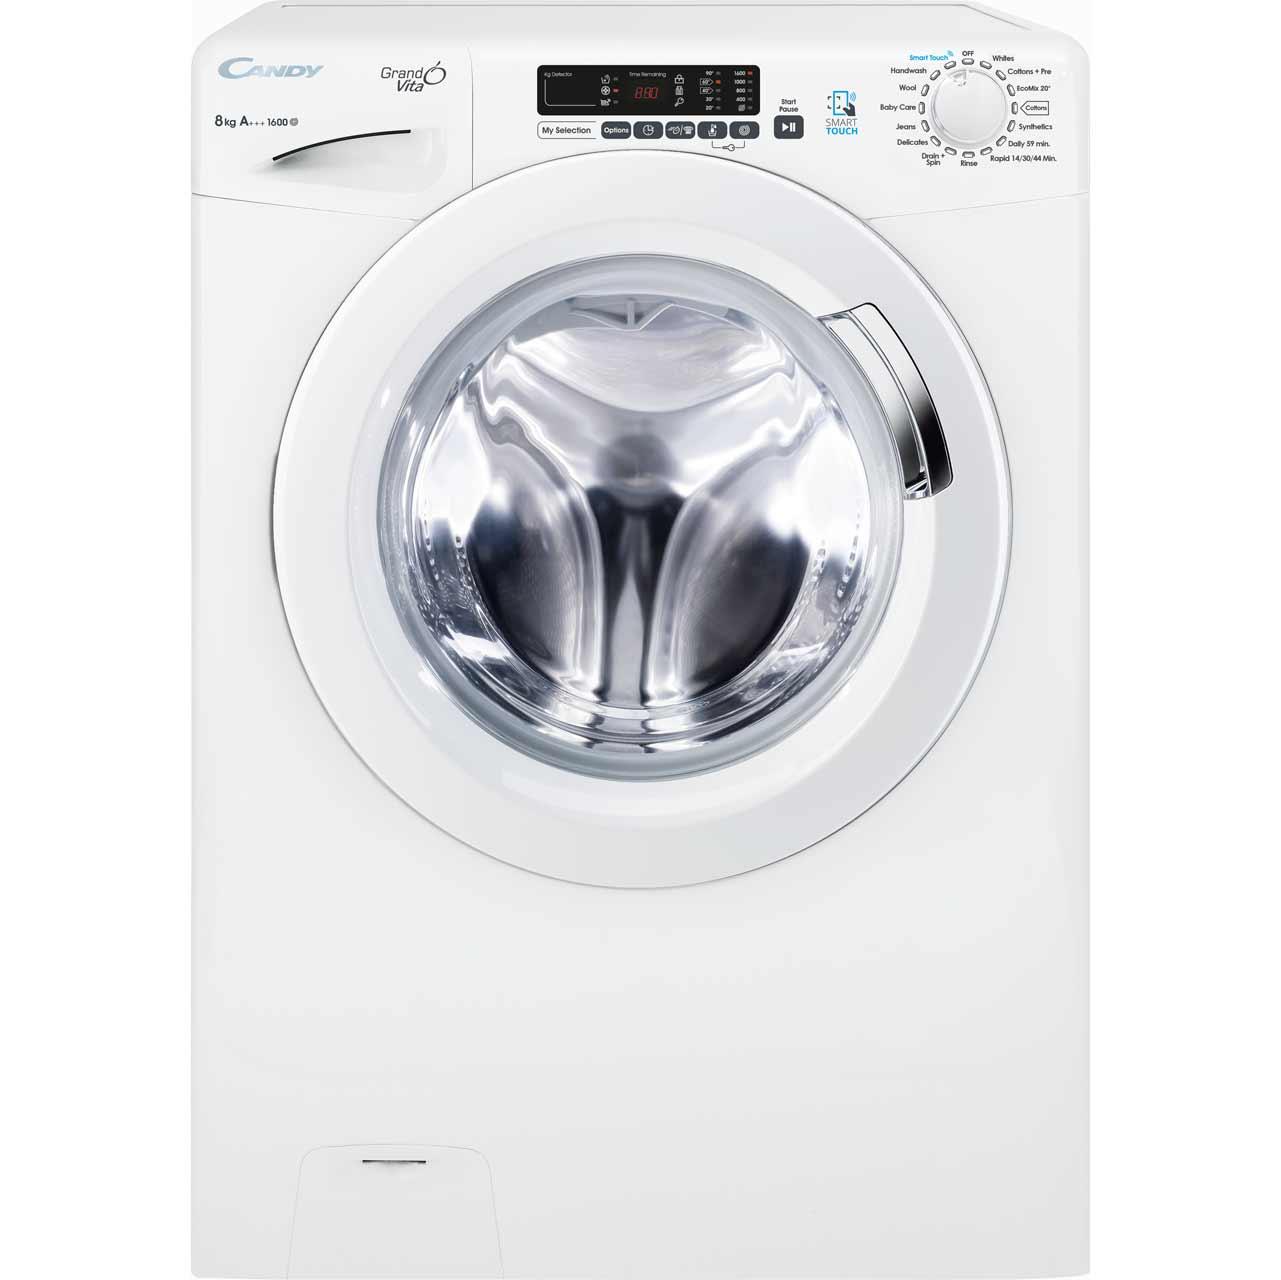 Candy Grand'O Vita GVS168D3 8Kg 1600rpm Washing Machine - White - A+++ Rated £209 / Candy GVS169DC3 9Kg 1600rpm £229 @ AO